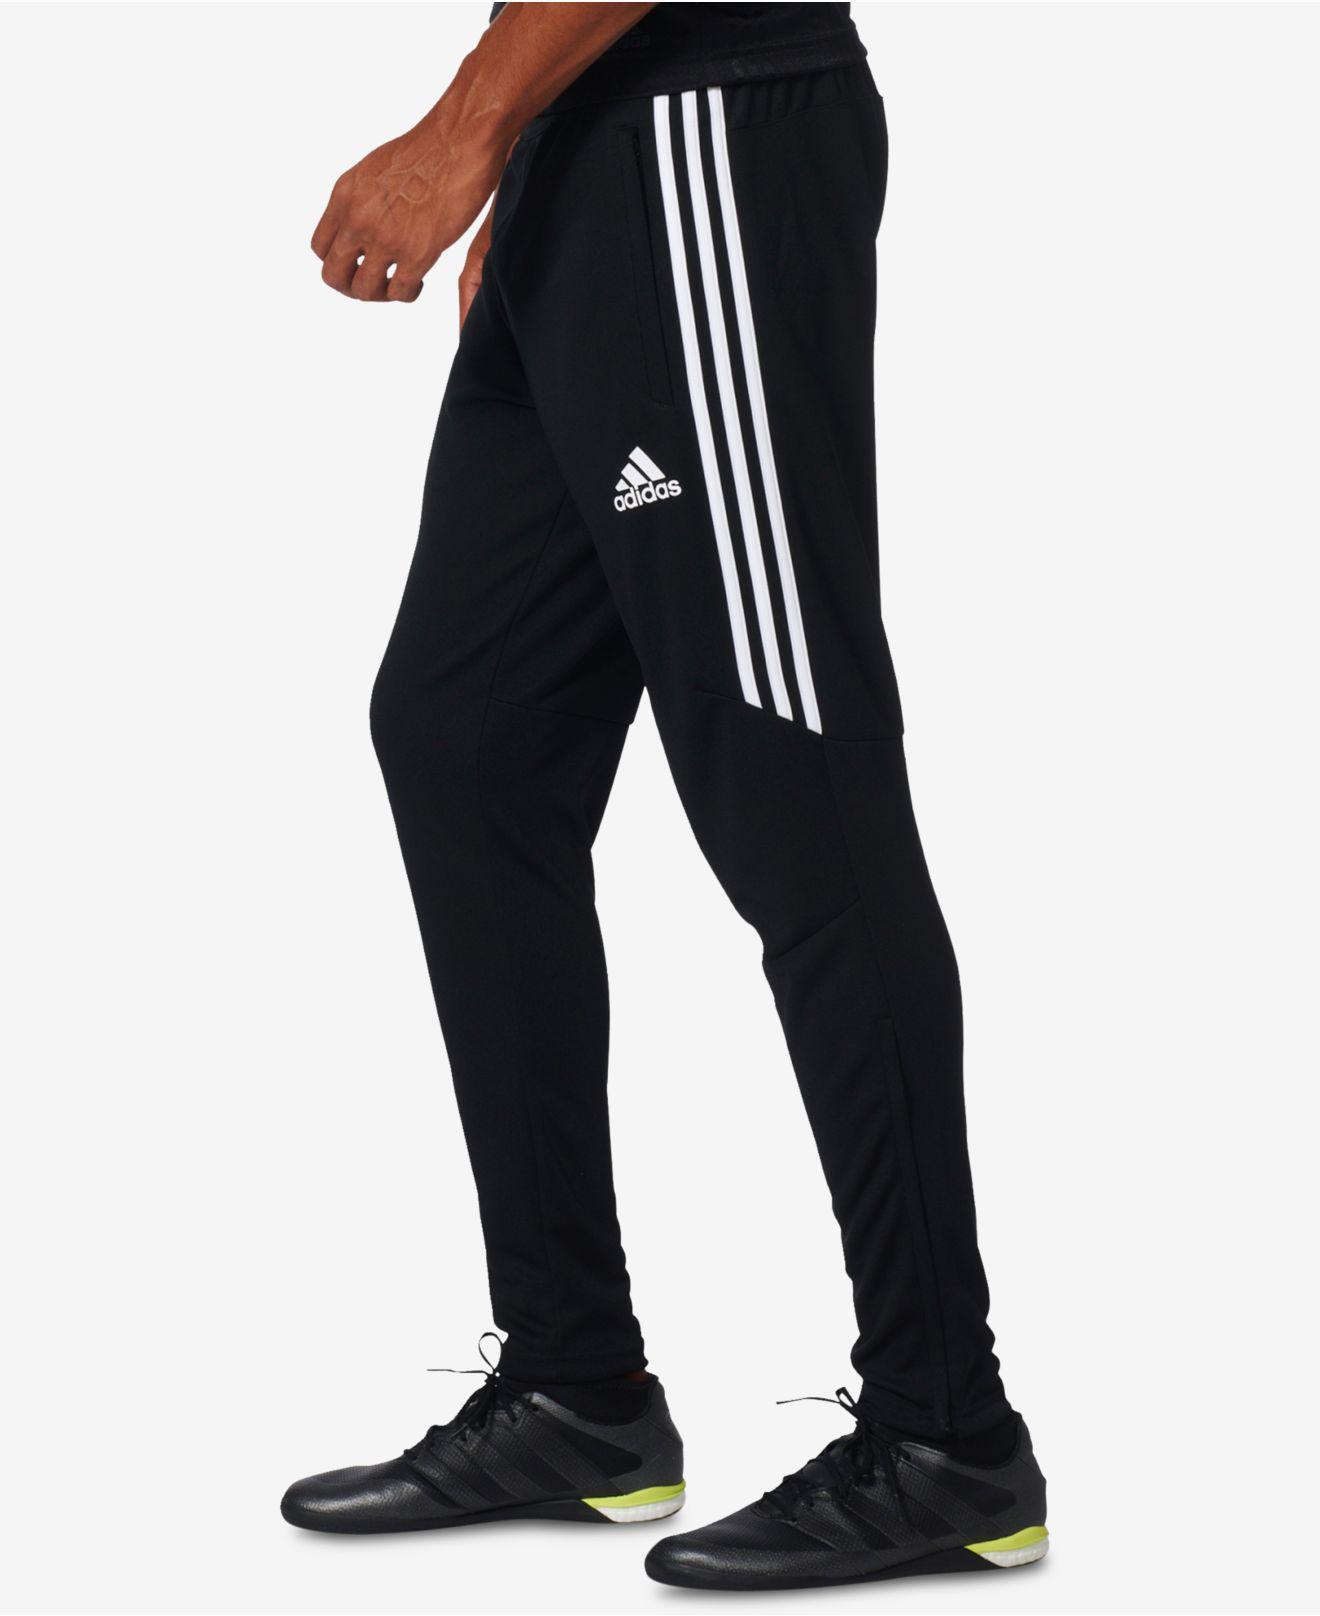 72cc54437a2b0 adidas mens soccer pants